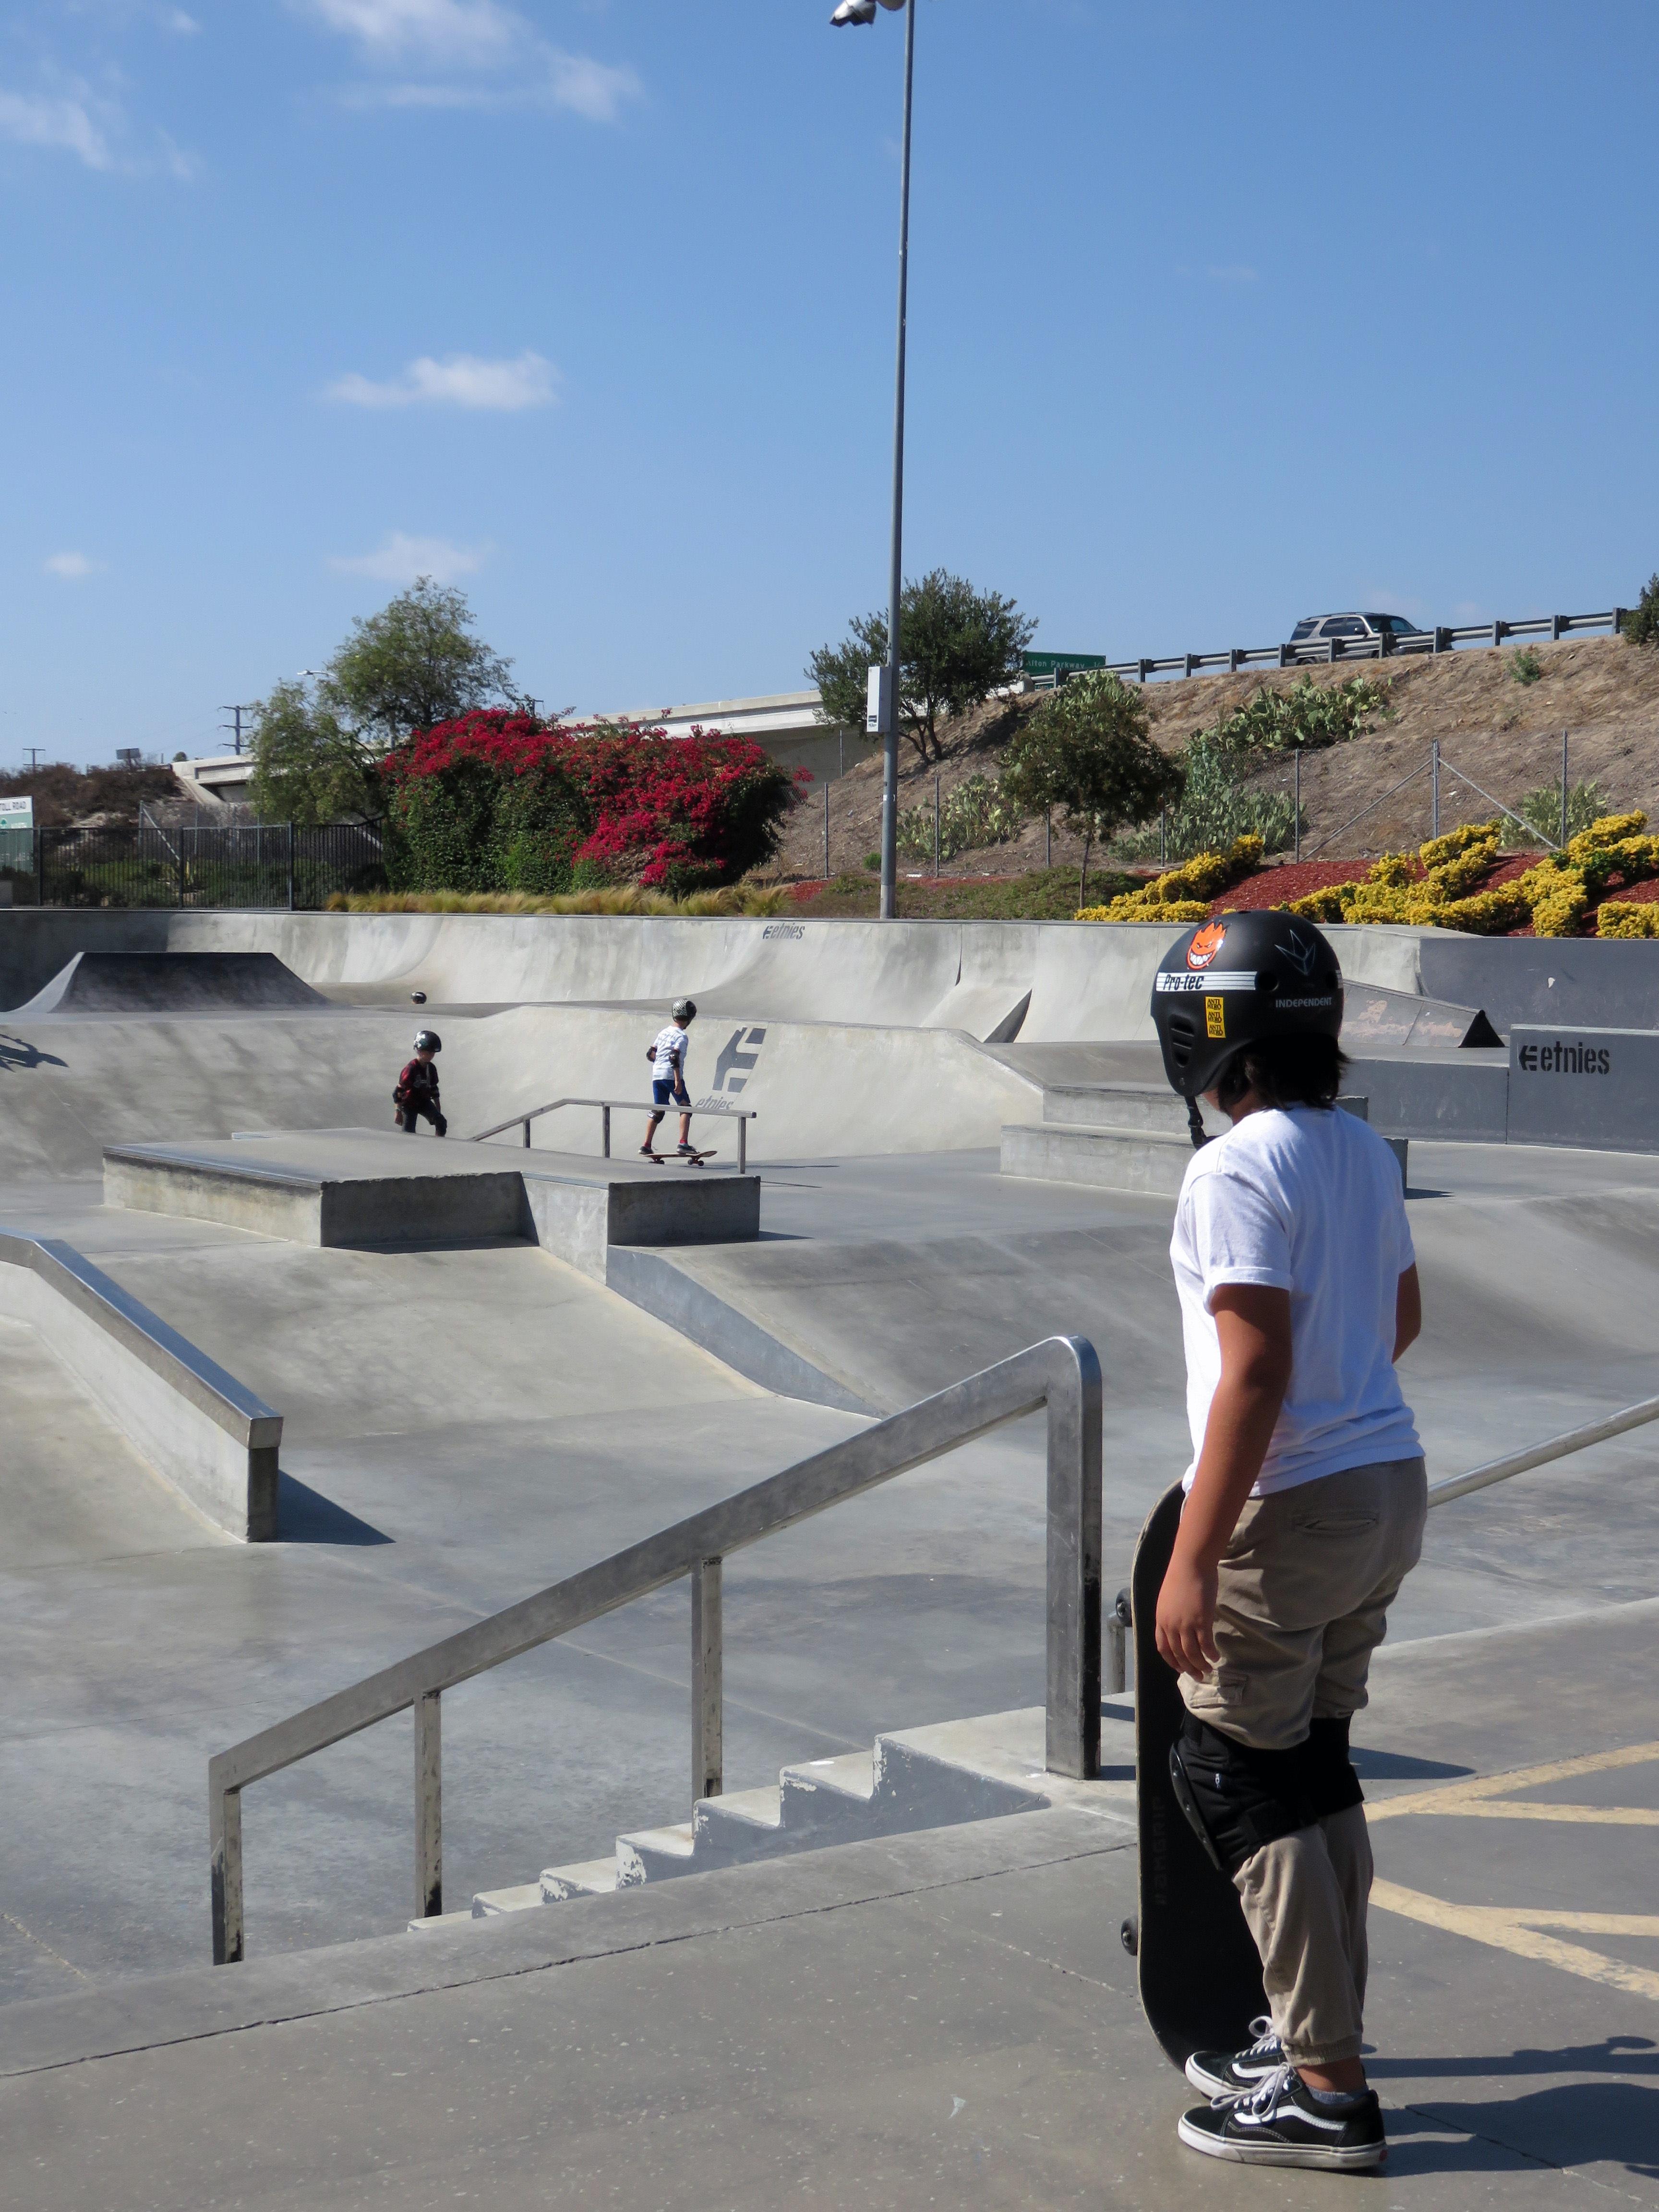 fotos gratis la carretera patineta skateboarding parque extremo hormig n skater parque. Black Bedroom Furniture Sets. Home Design Ideas